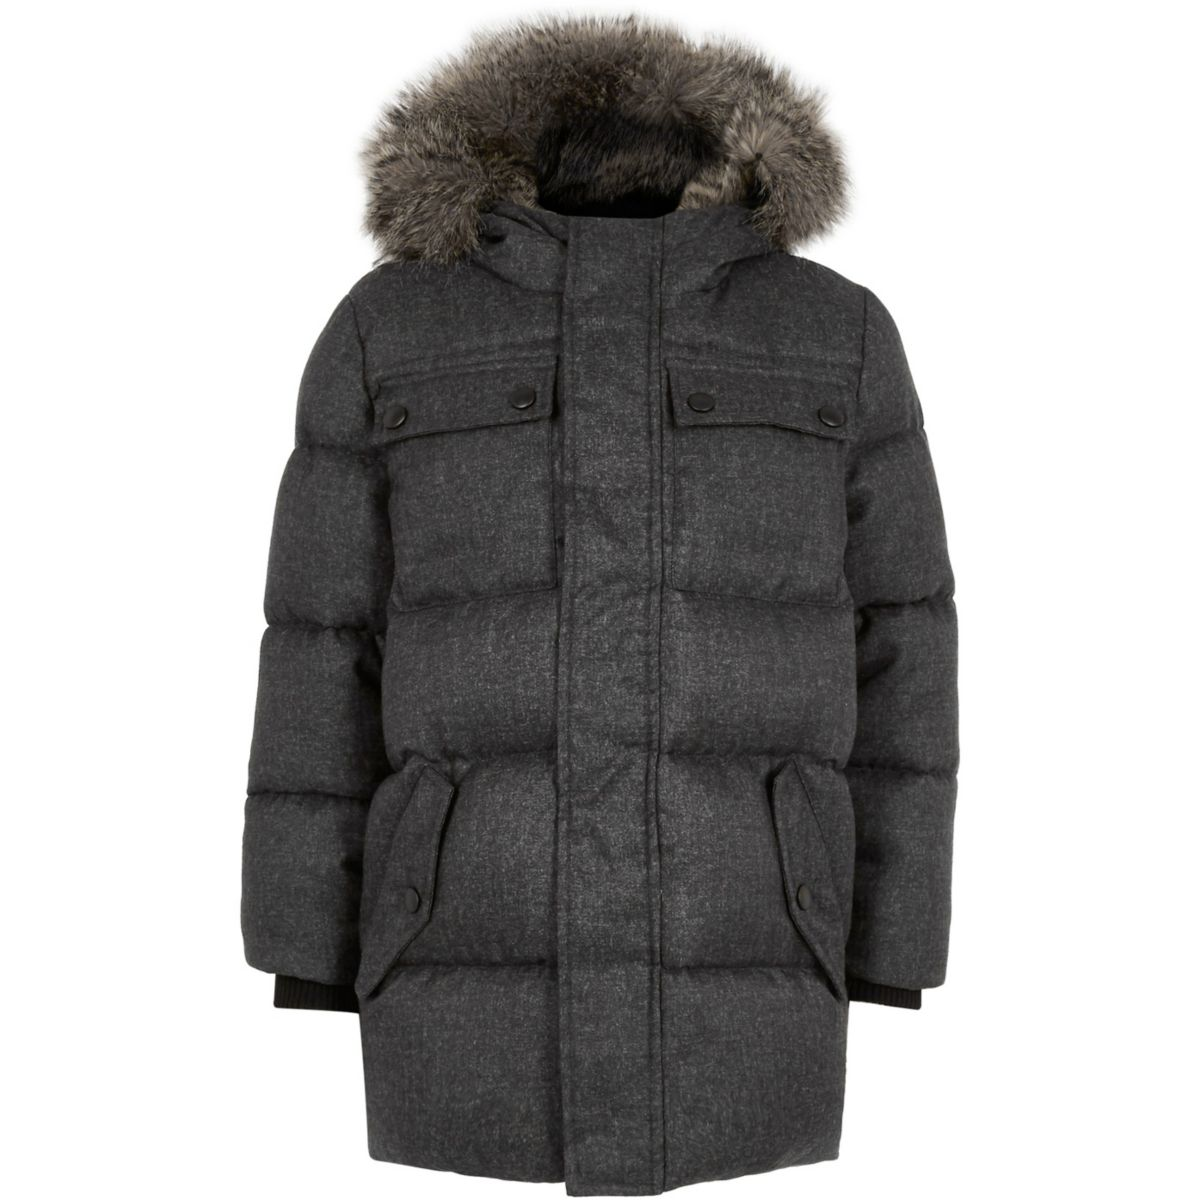 Boys grey faux fur hood puffer coat - Coats - Coats